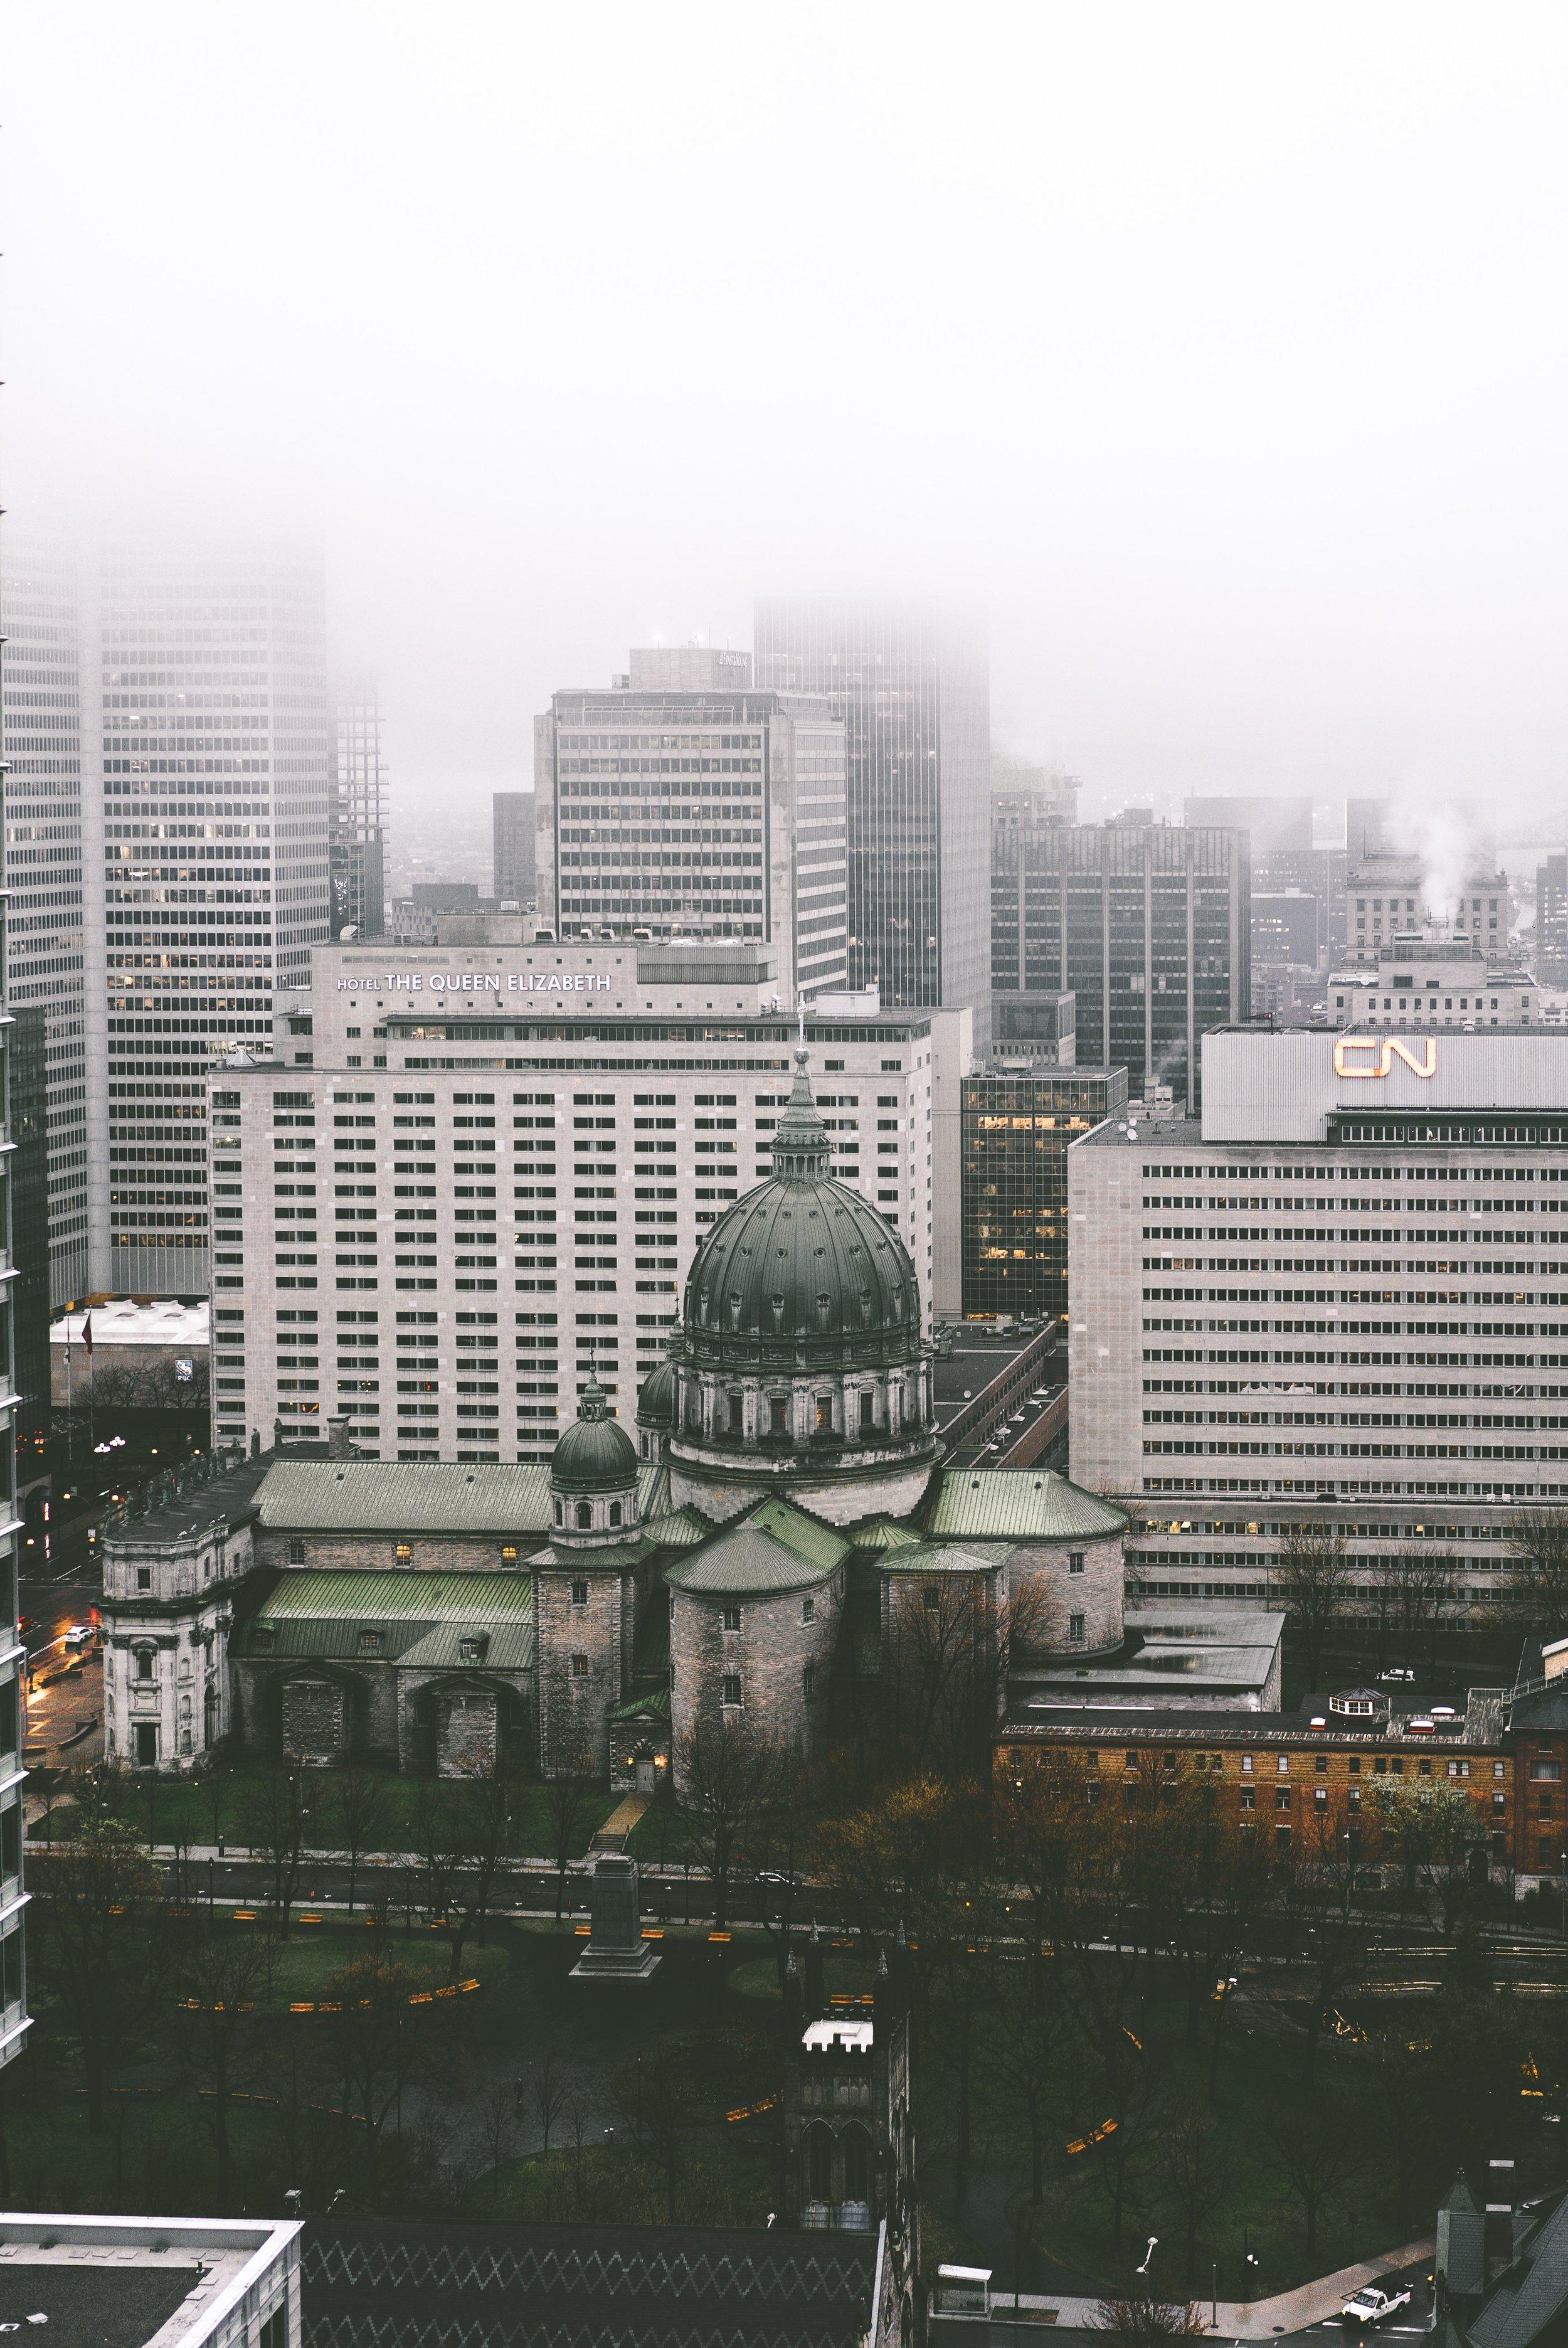 Tour des Canadiens, Montreal, Canada